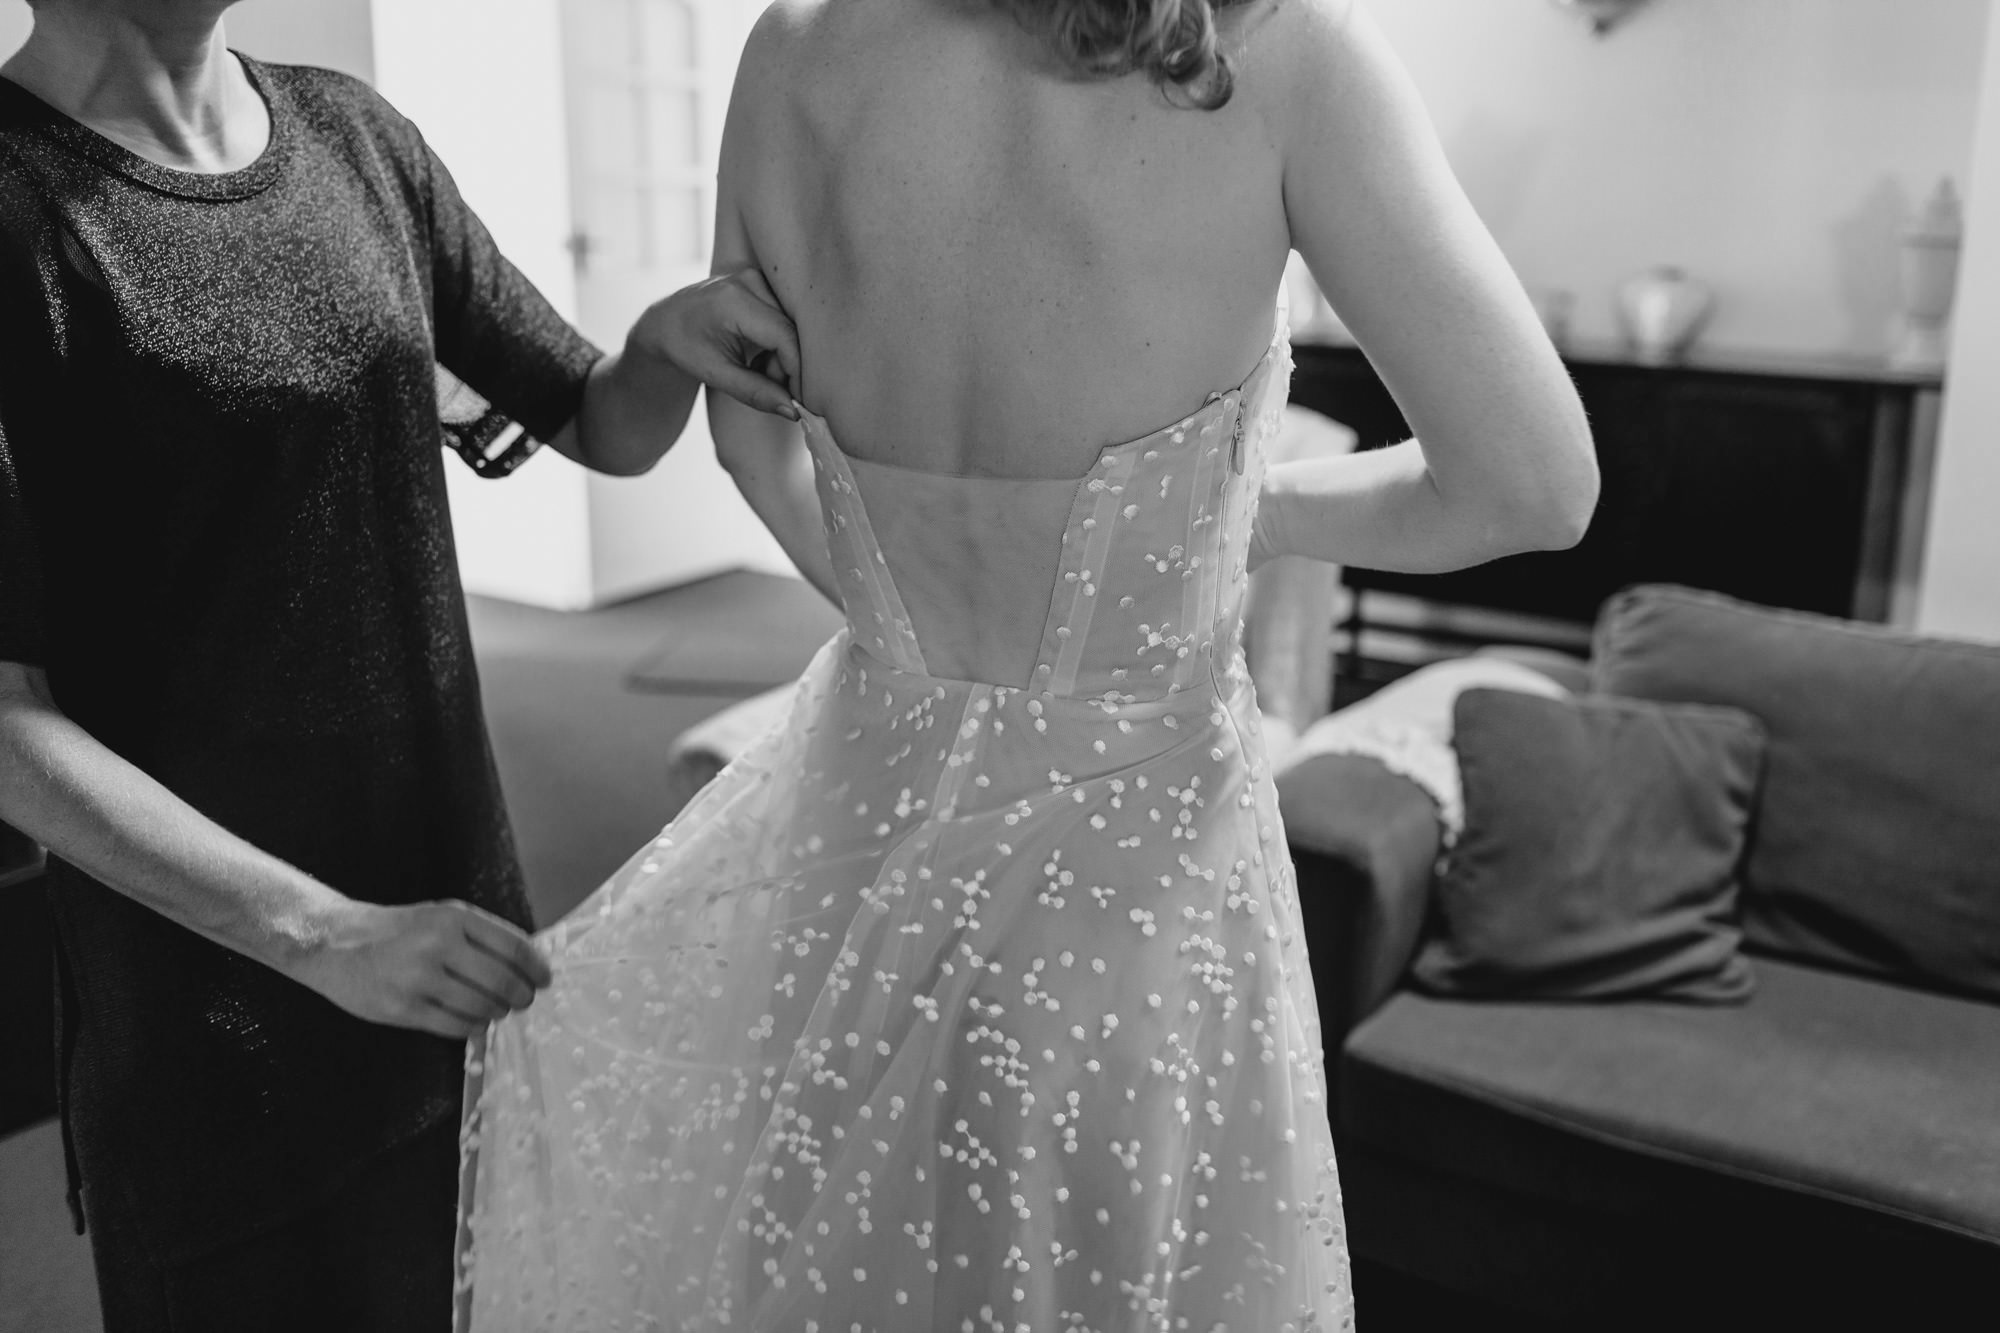 Bride getting ready at bimbadgen palmers lane wedding